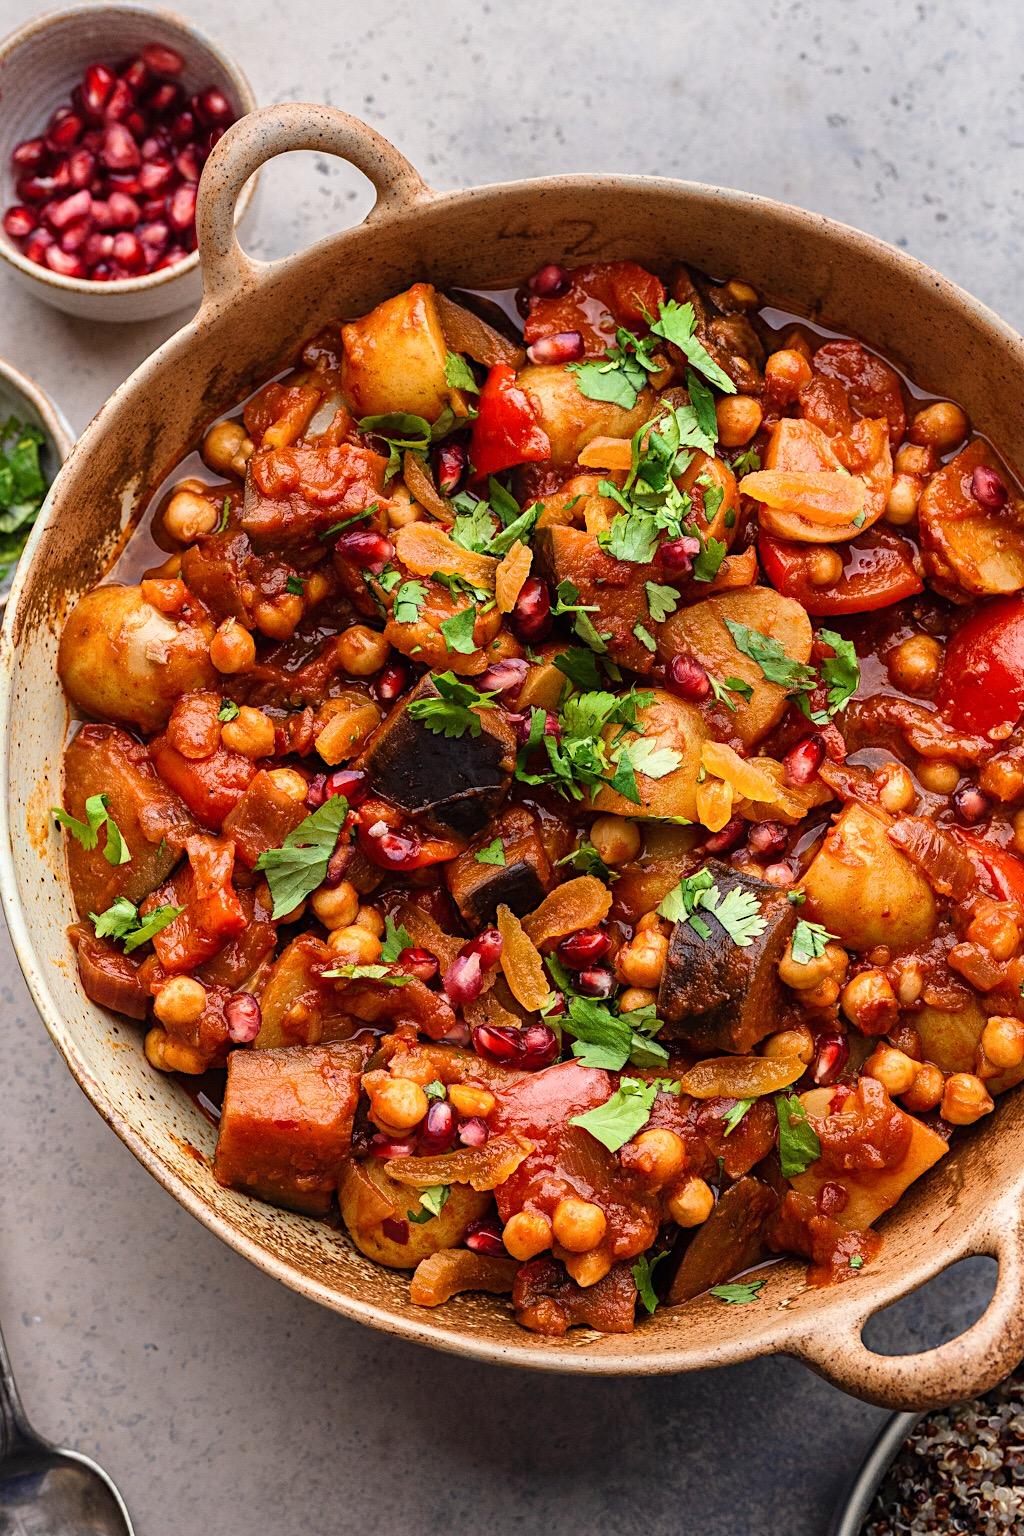 Harissa Vegetable and Chickpea Stew #moroccan #vegan #dairyfree #stew #onepot #recipe